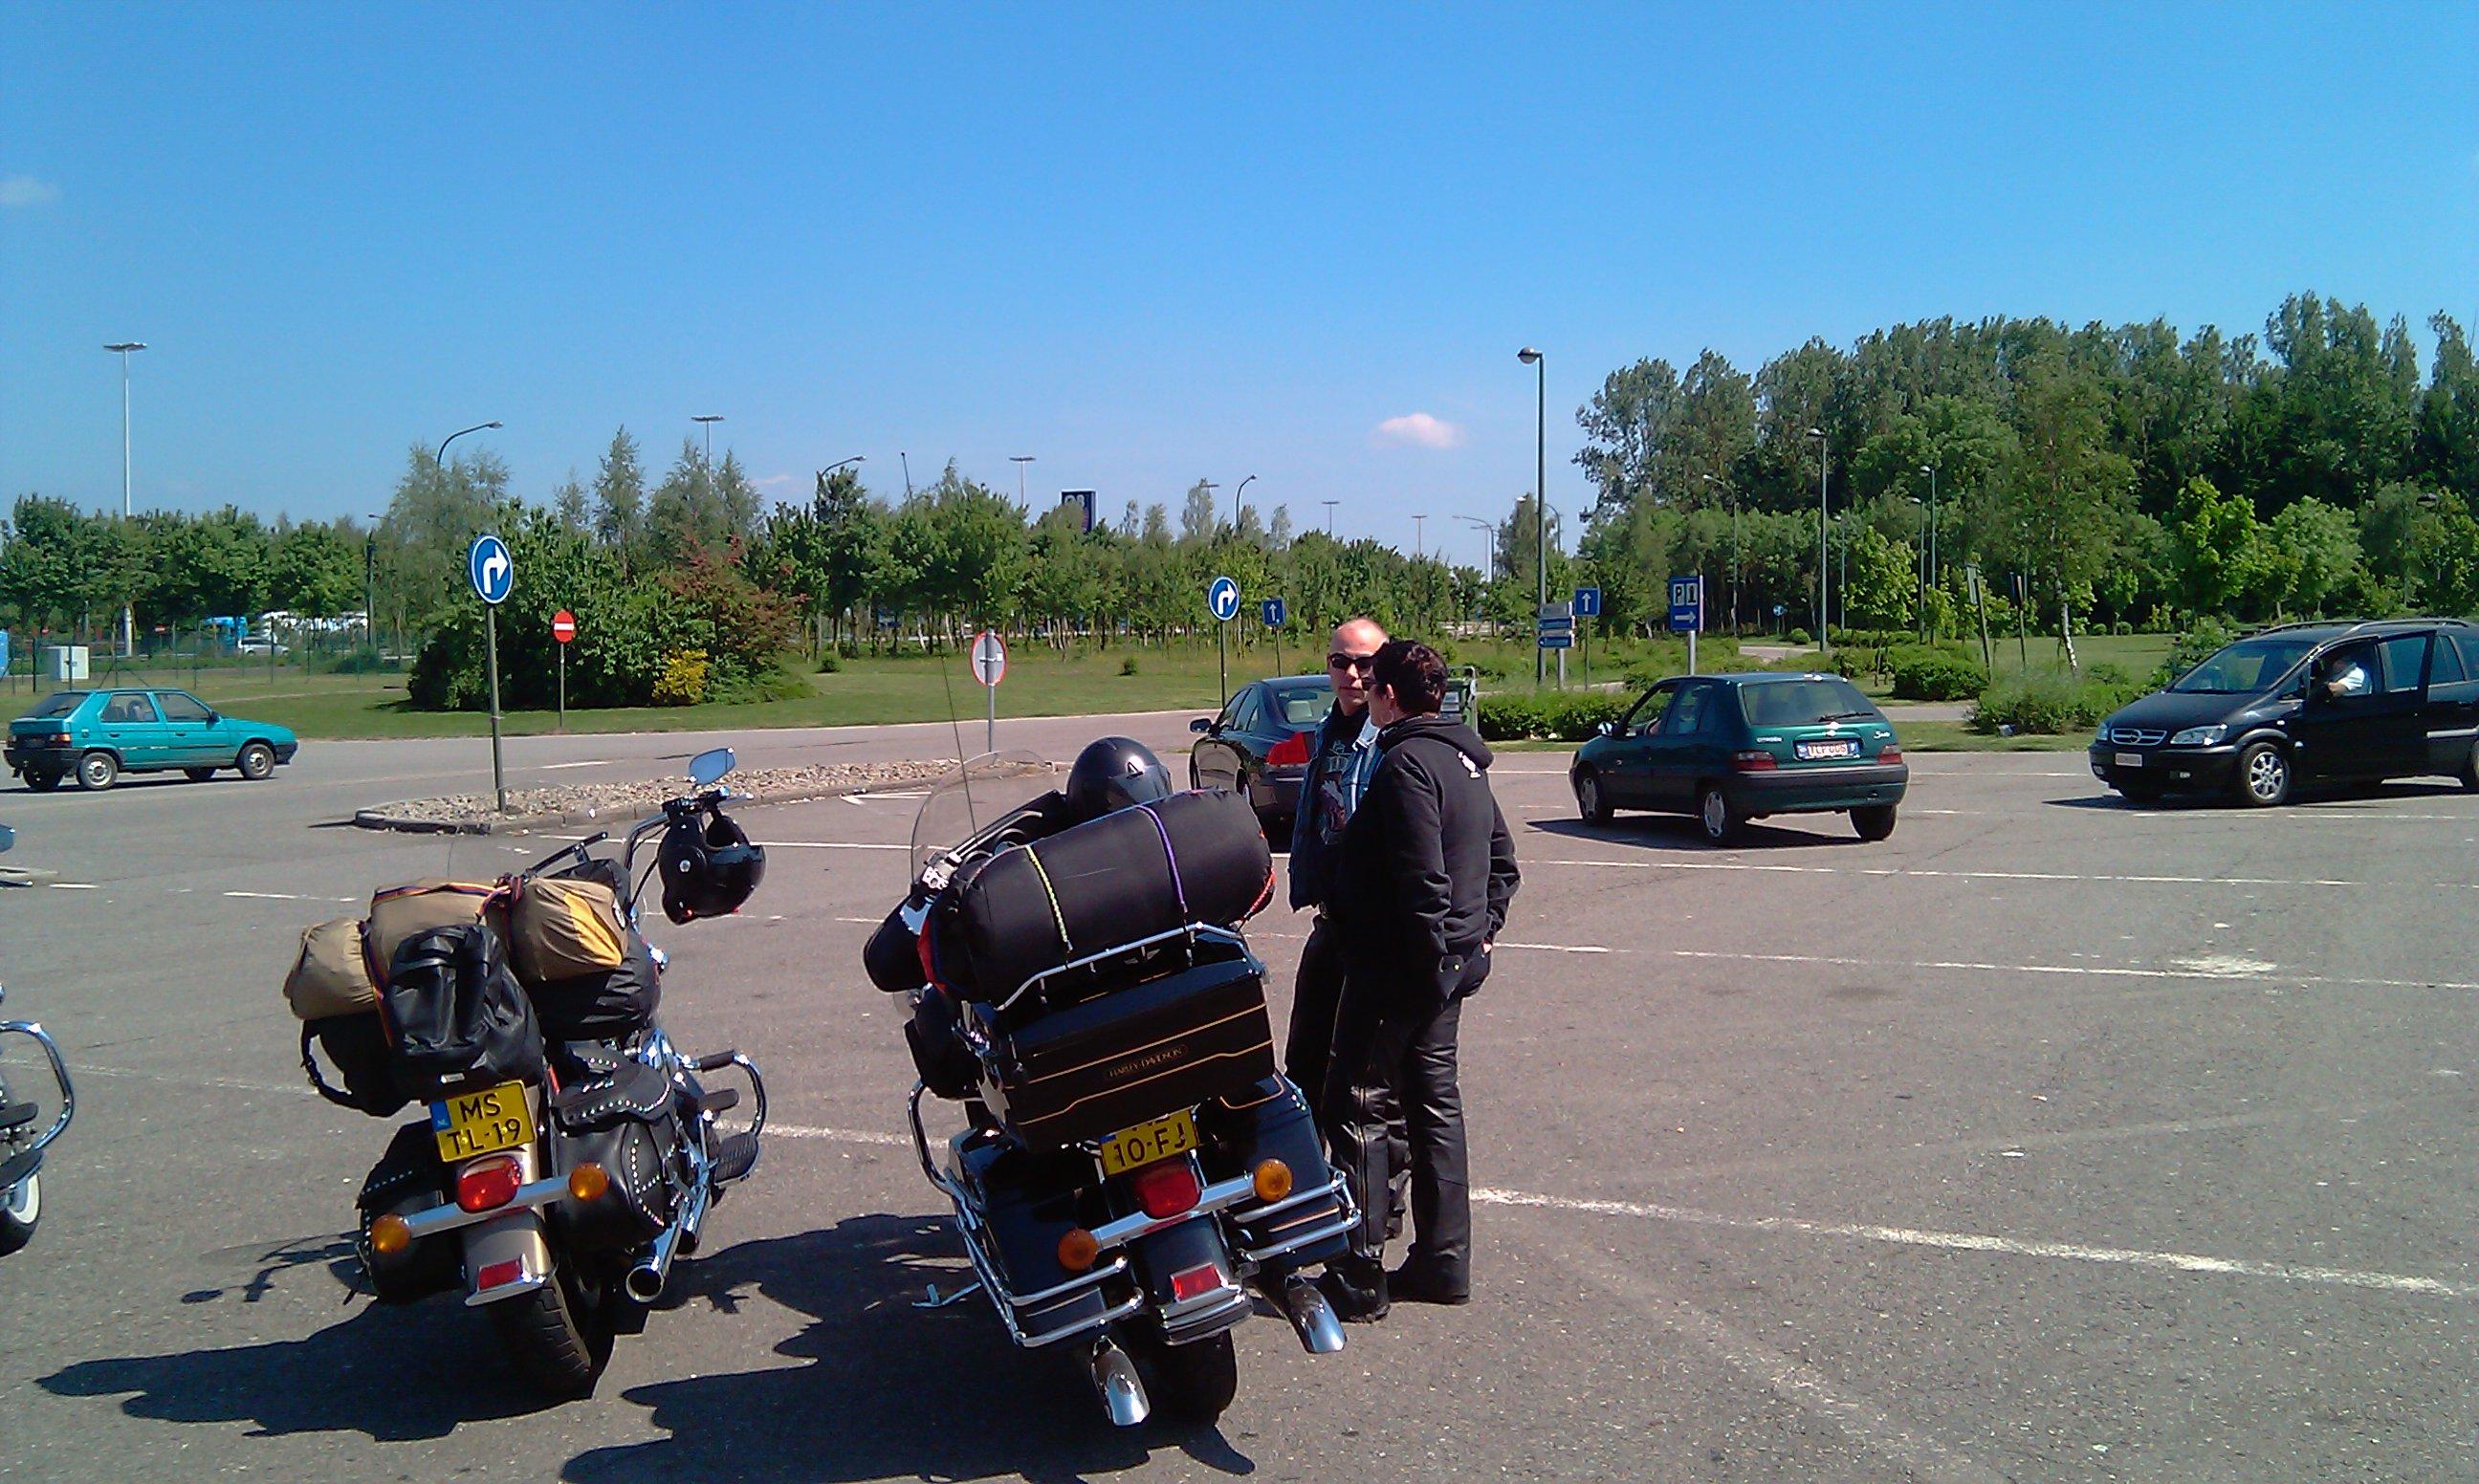 2010-06-03-Luxenburg-Hog ralley (2)